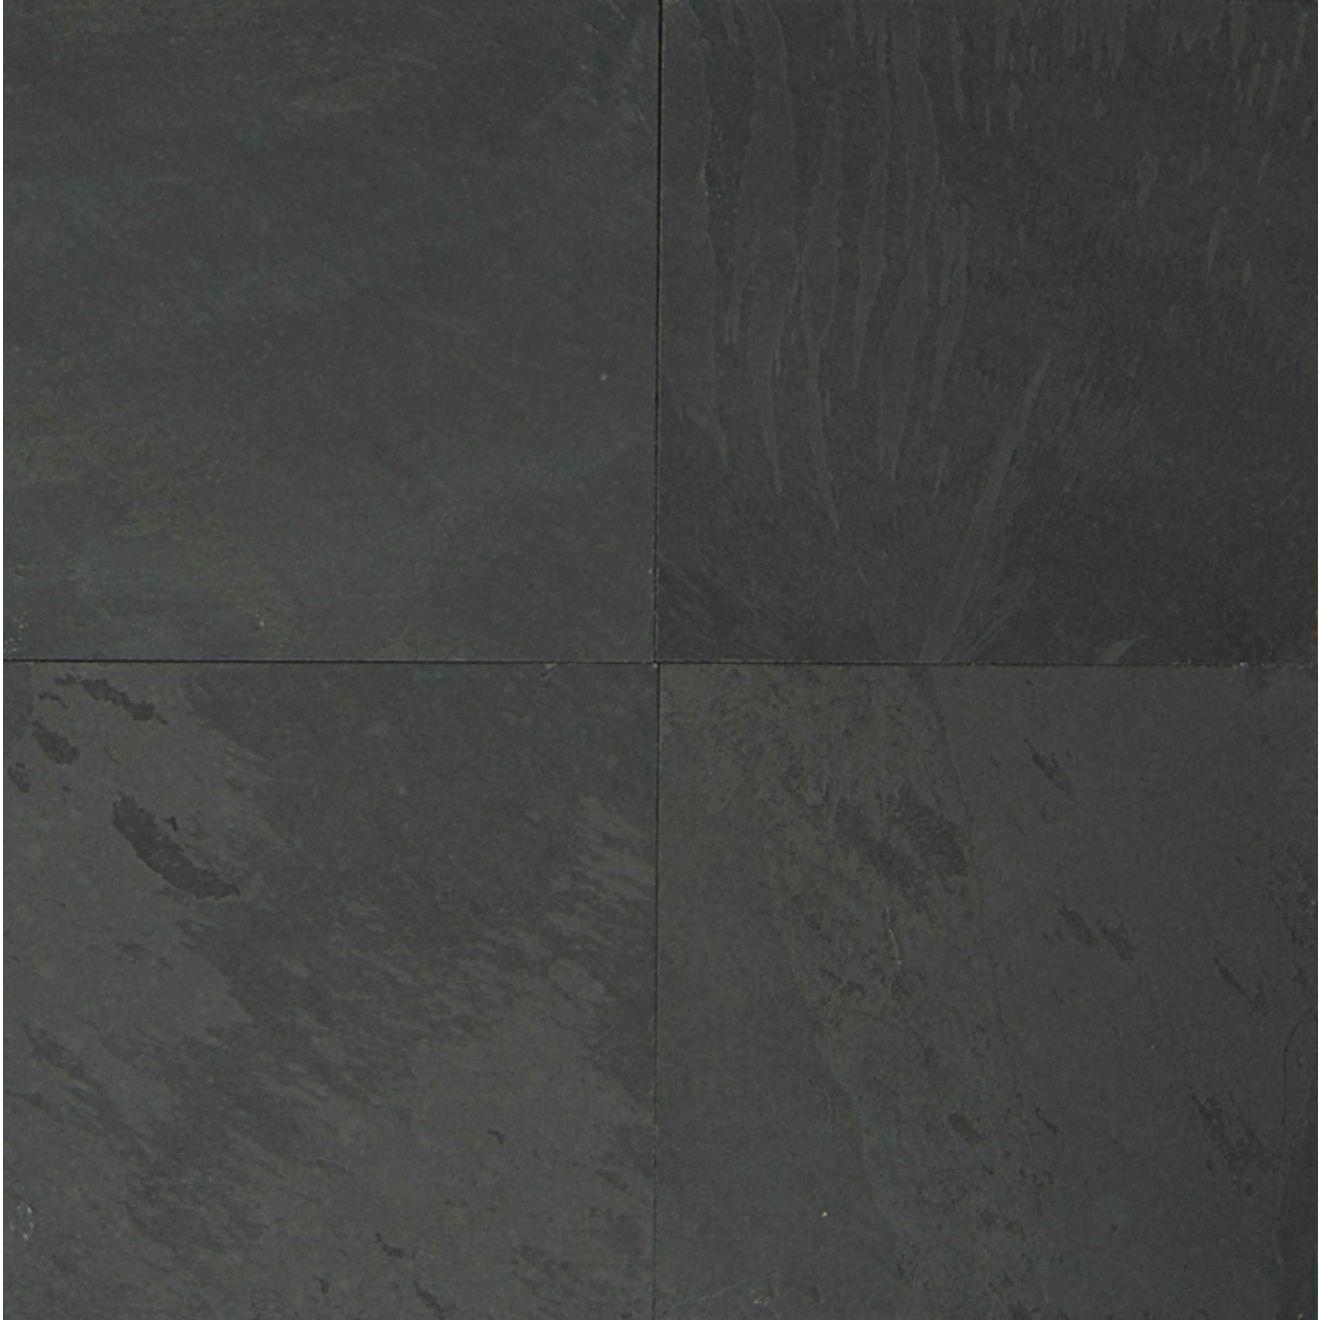 "Black Pearl 24"" x 24"" Floor & Wall Tile"